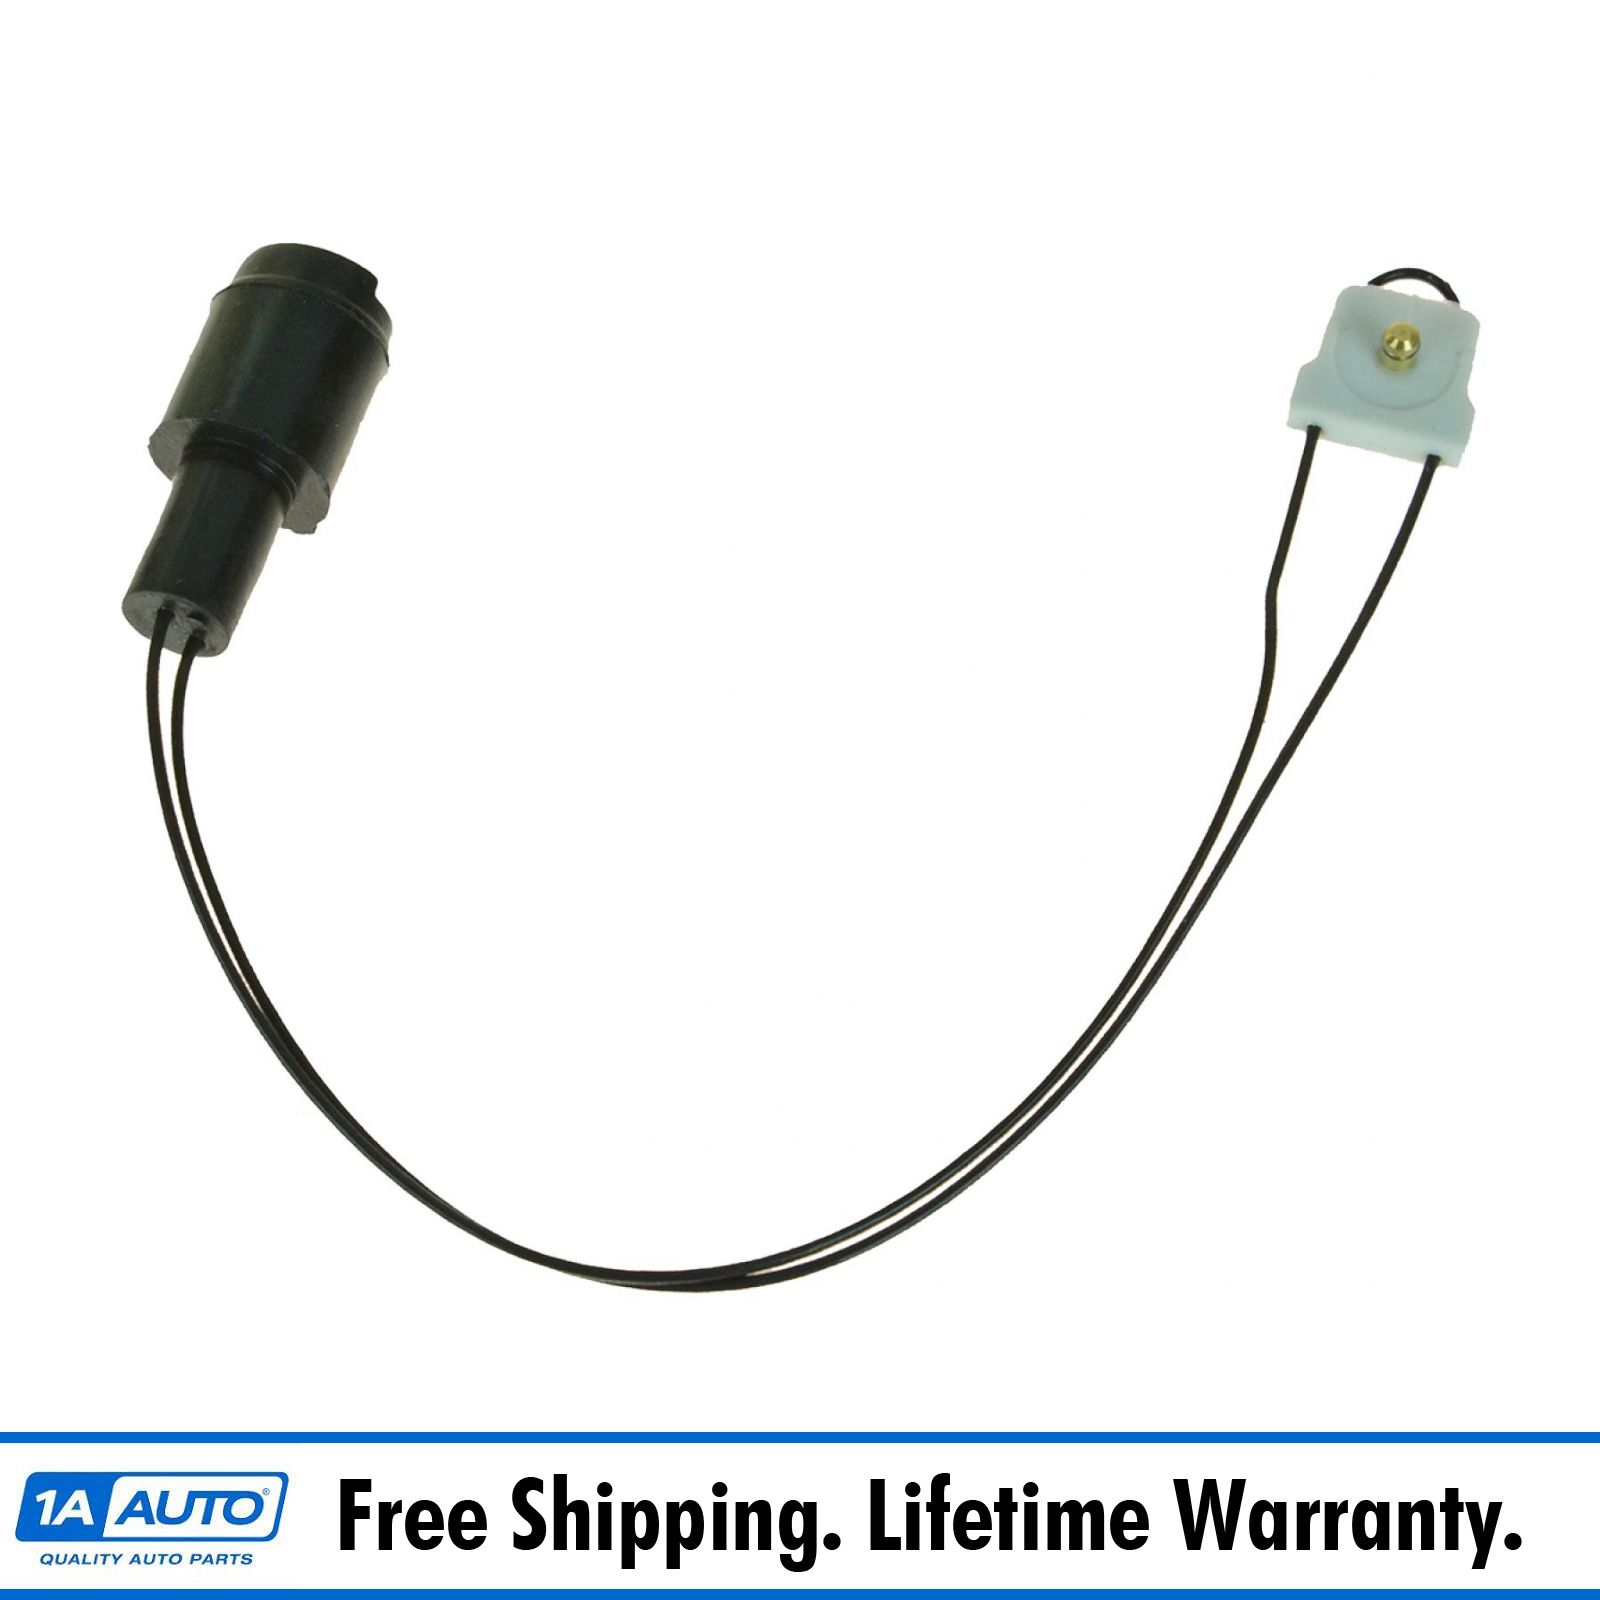 Front Disc Brake Pad Wear Sensor for BMW E30 3 Series